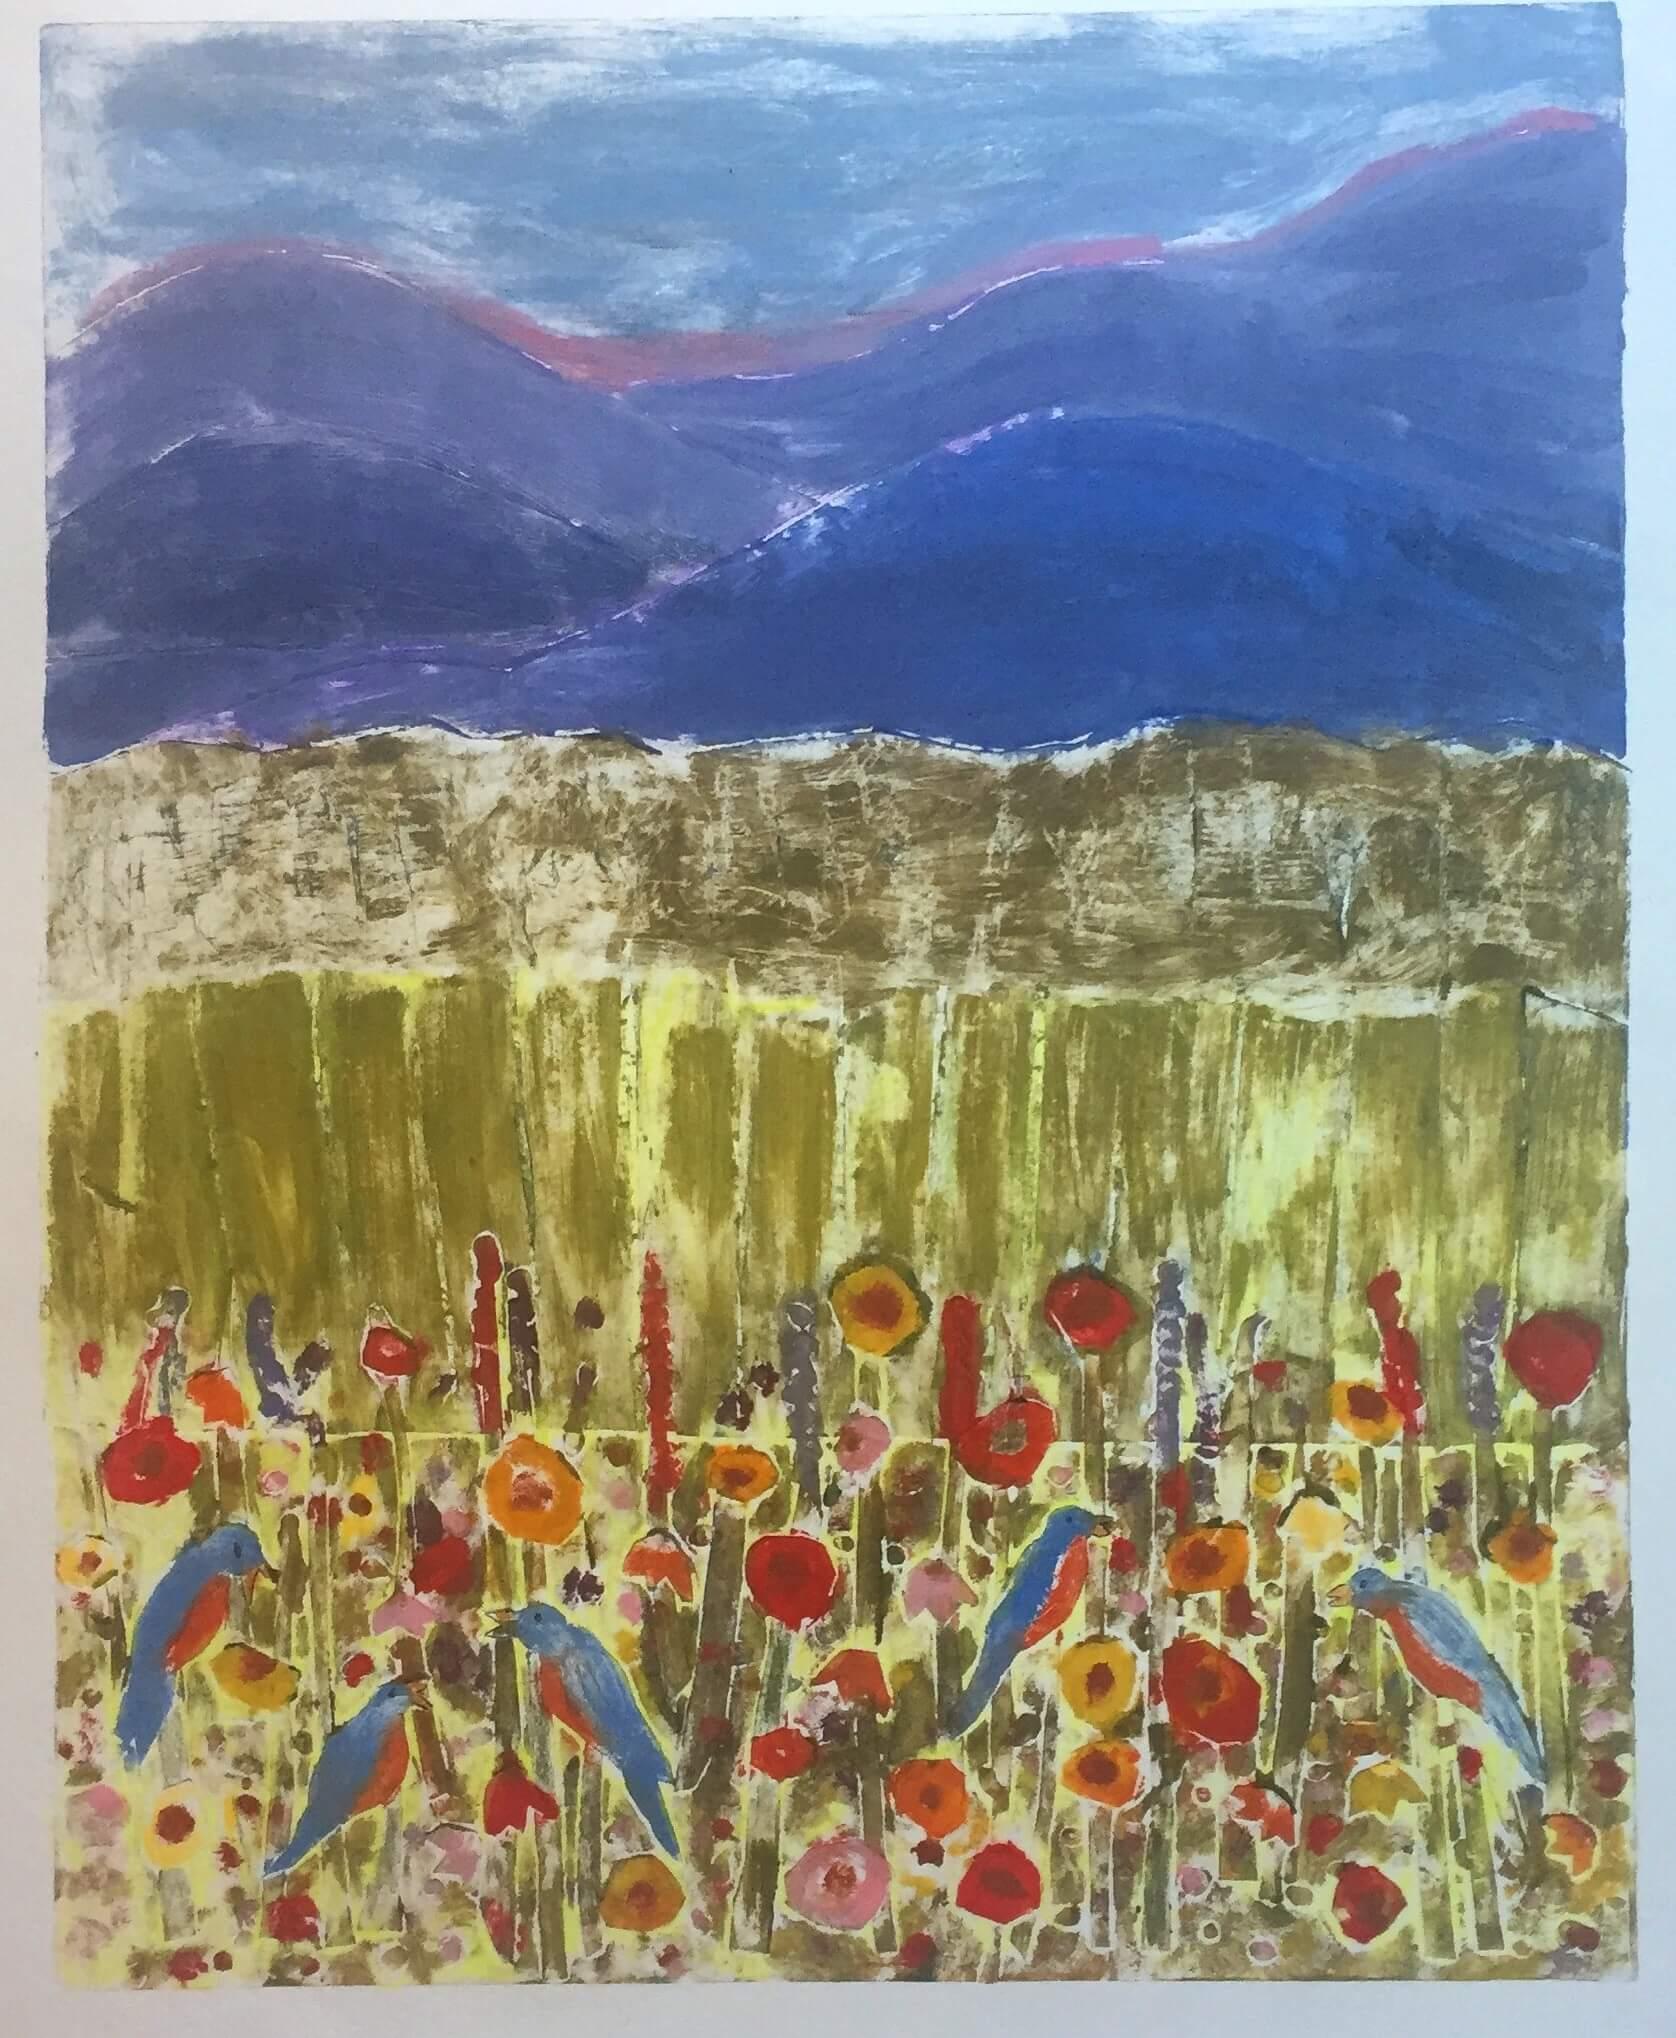 Angela Finney - Mountain Memories II